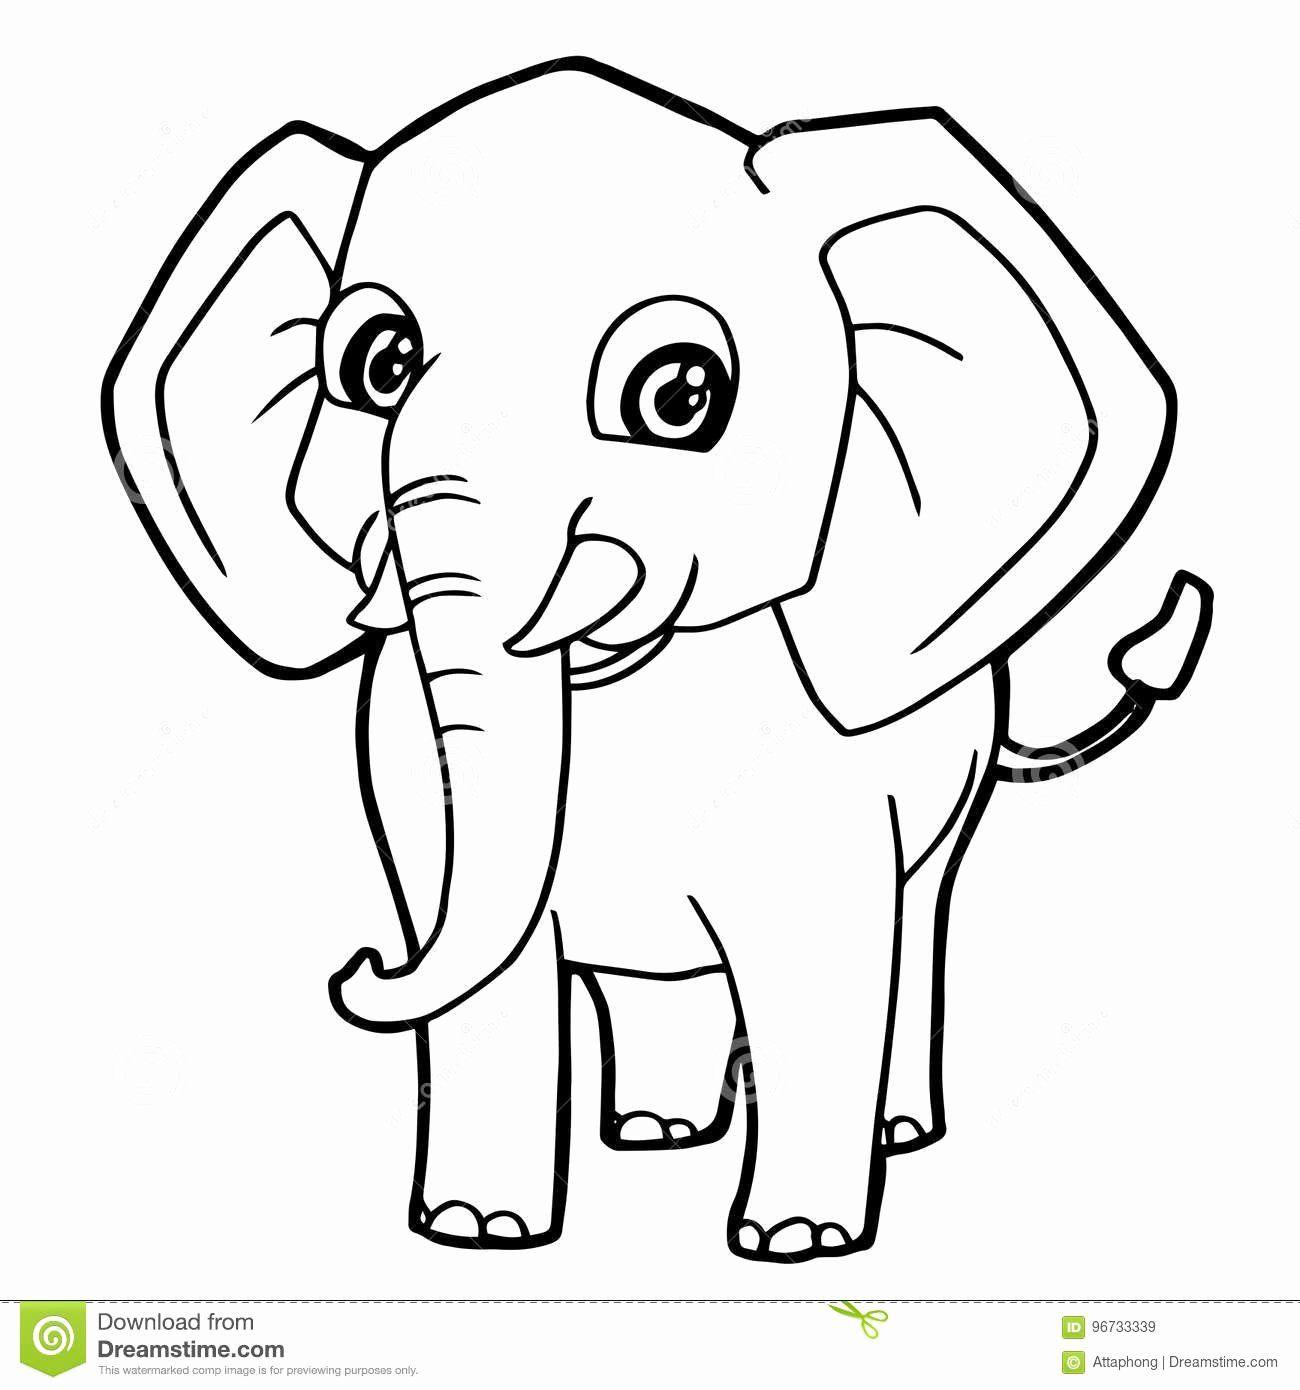 Elephant Cartoon Coloring Pages Unique Cartoon Cute Elephant